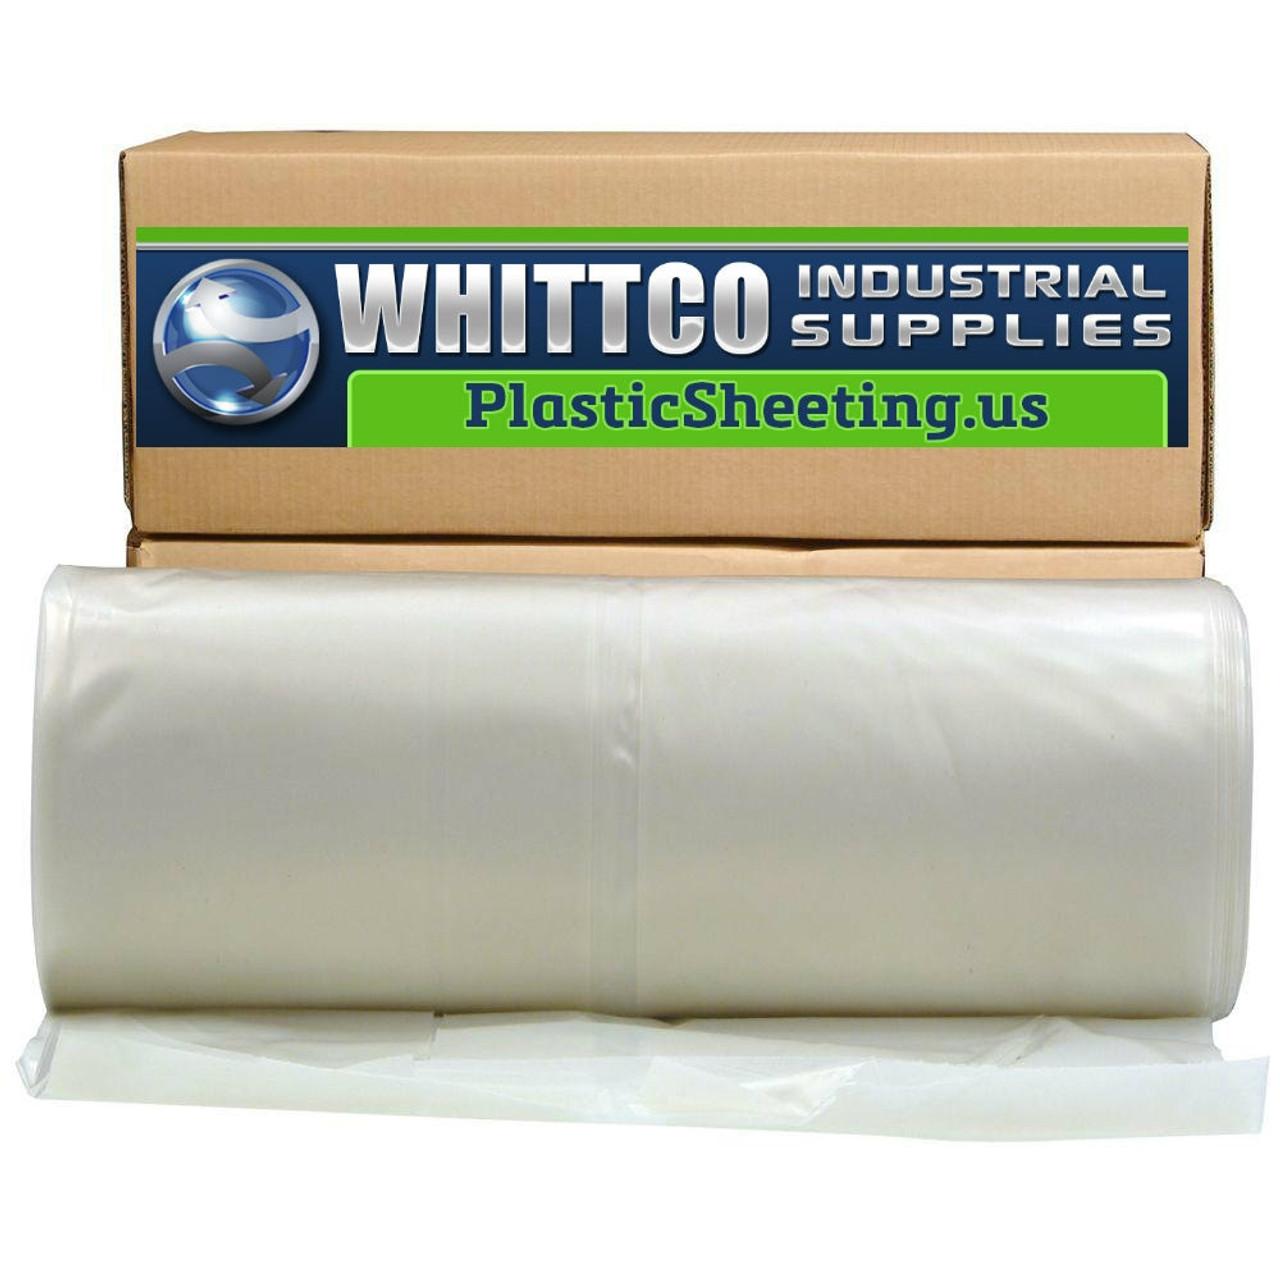 Clear Plastic Sheeting Husky__10379 1542509640 Jpgc2imbyp On